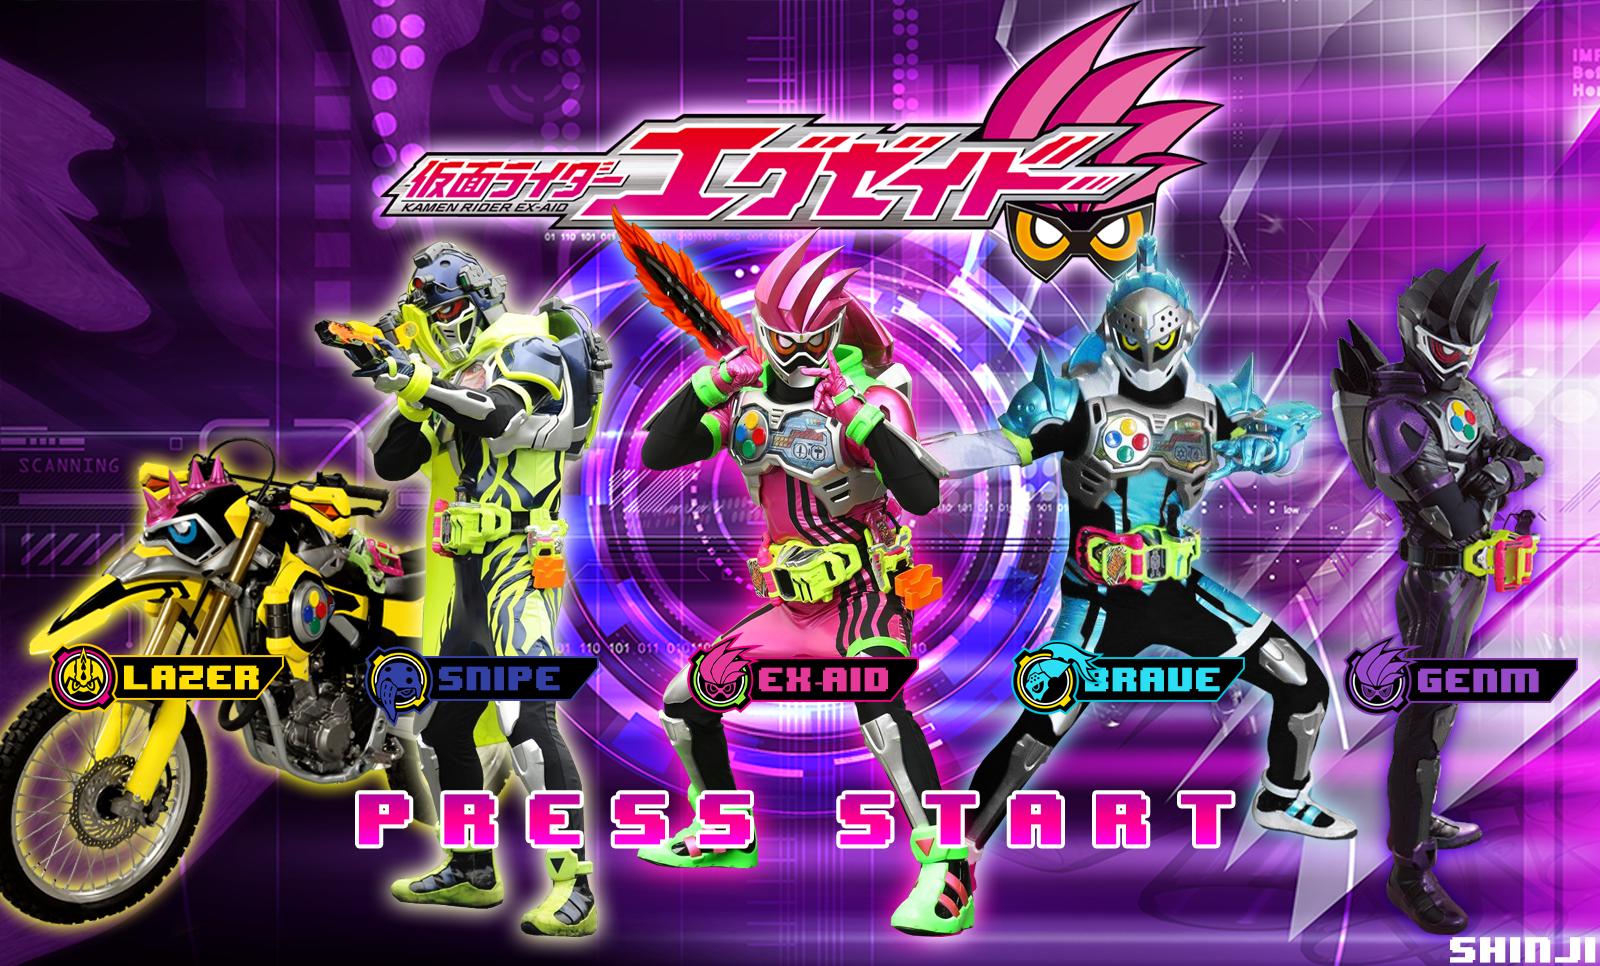 Kamen Rider Ex-Aid - Brave - Snipe - Lazer - Genm by malecoc